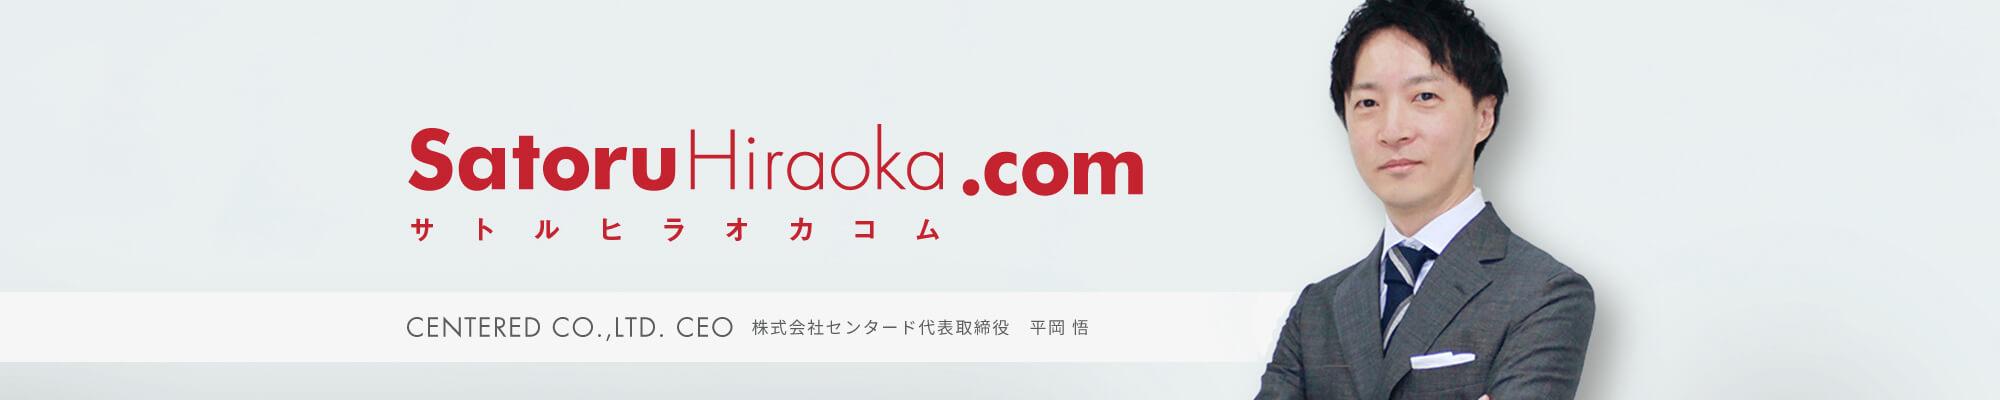 SatoruHiraoka.com サトルヒラオカコム CENTERED CO.,LTD. CEO 株式会社センタード代表取締役 平岡 悟